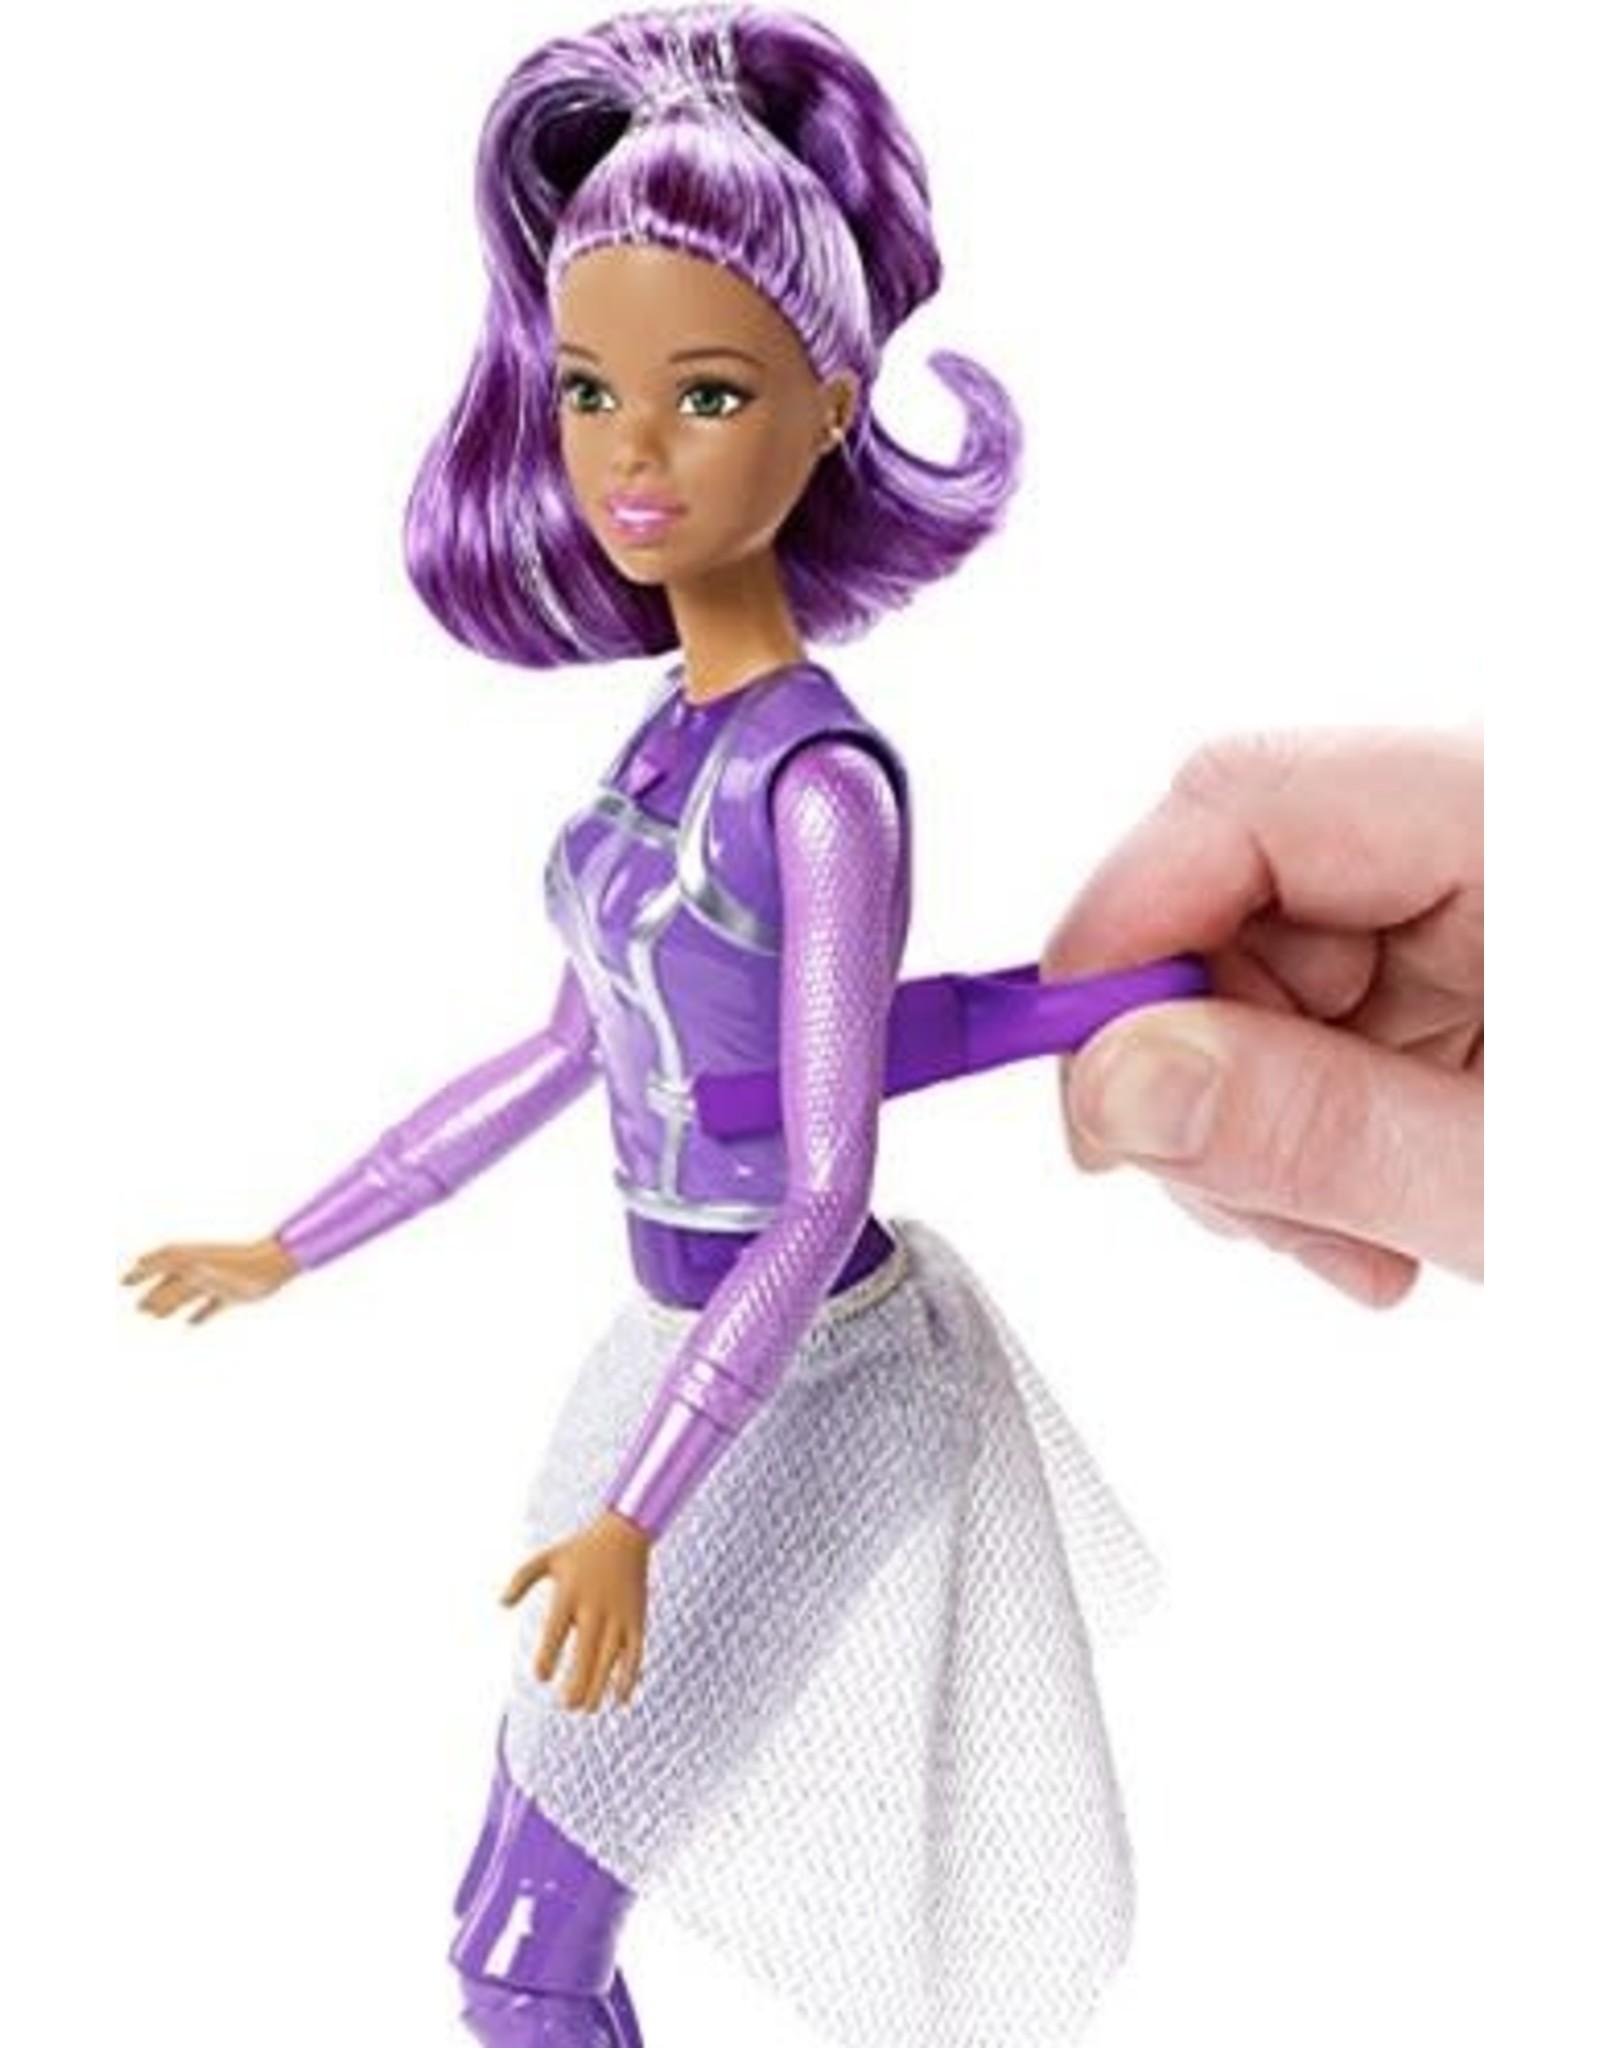 MATTEL Barbie Star Light Avontuur Lichtjes & Geluidjes Ho